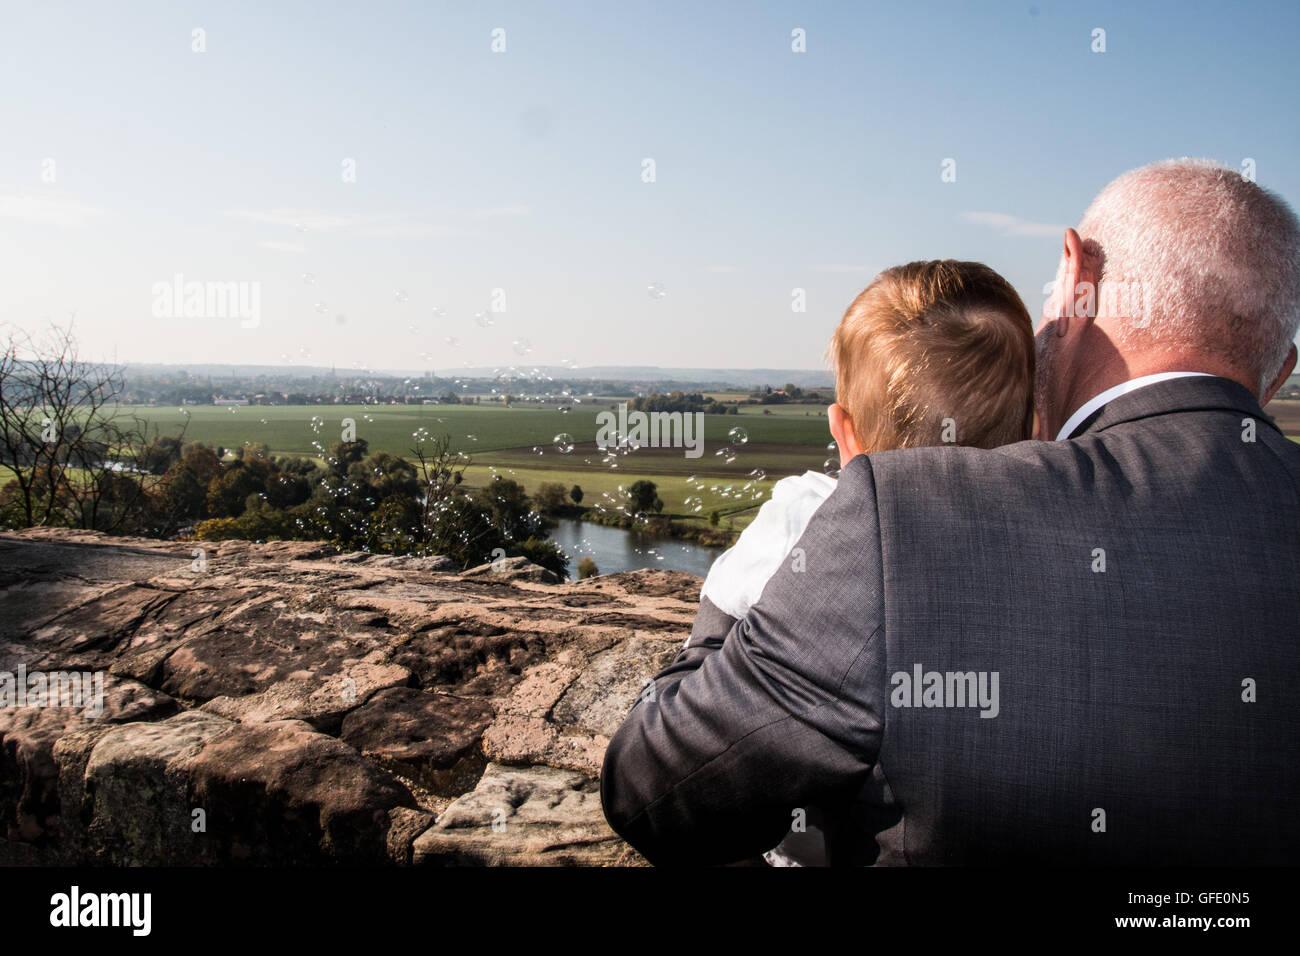 Generations - Stock Image